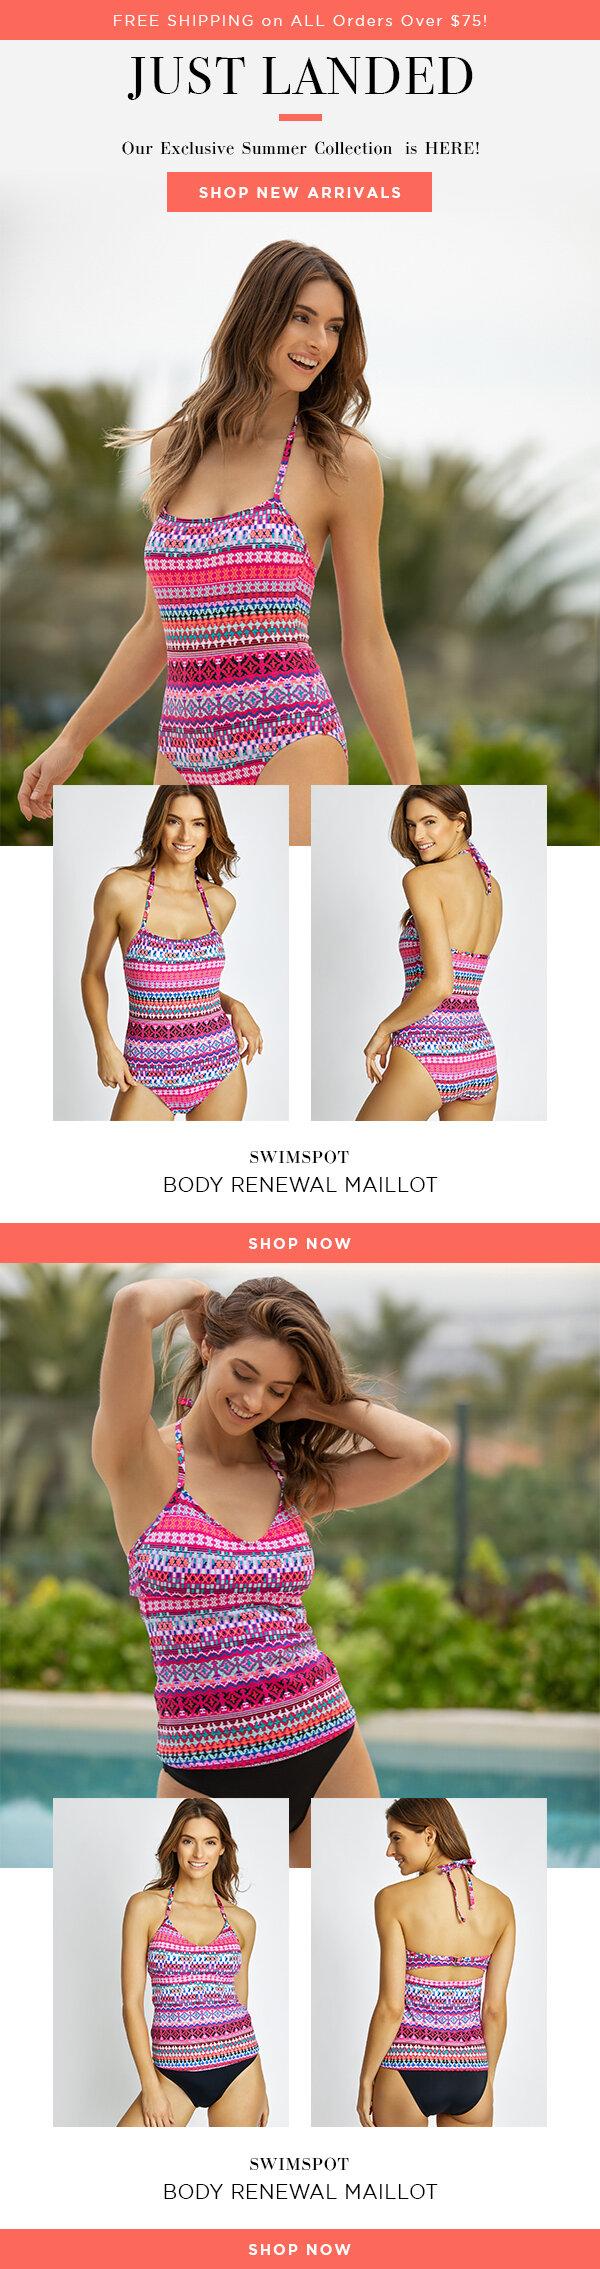 Swimspot 6_5 Missy Prints Email.jpg